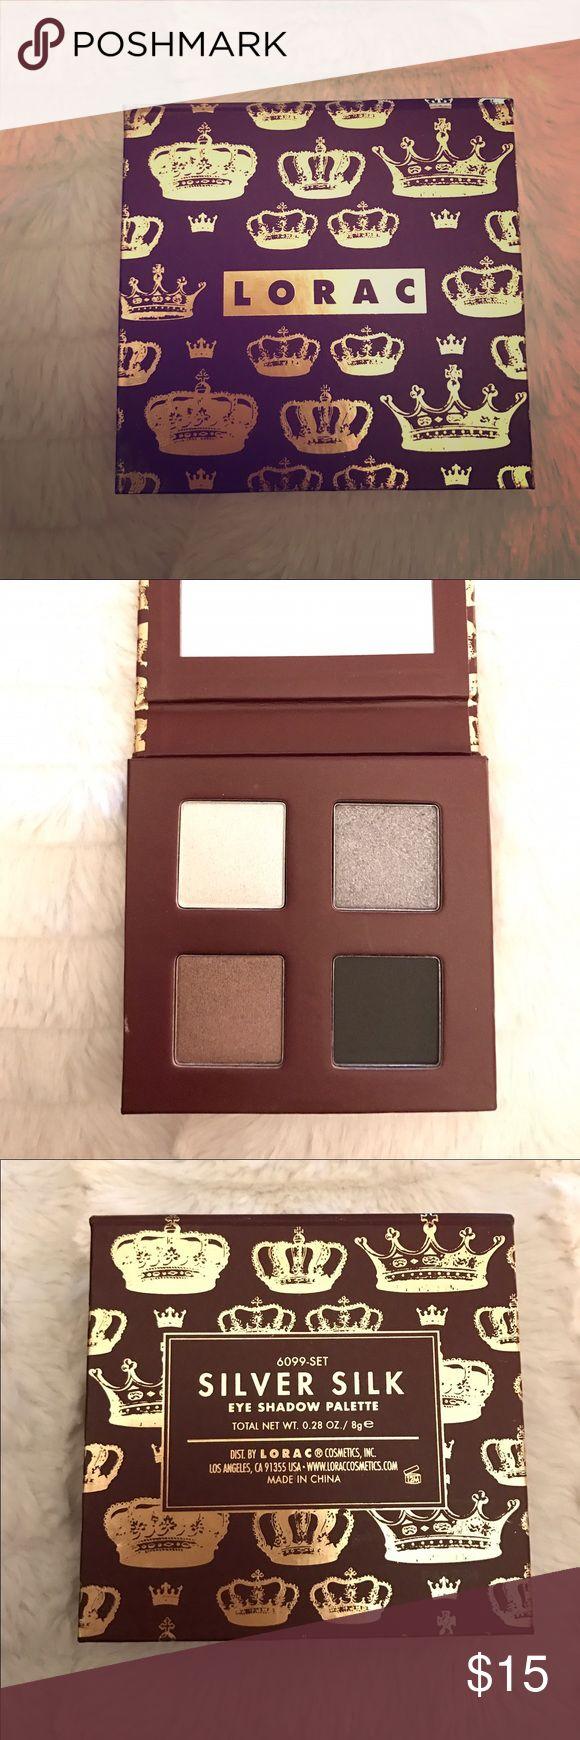 Lorac eyeshadow quad Brand new, never used eyeshadow palette.   Great for a smoky eye! LORAC Makeup Eyeshadow